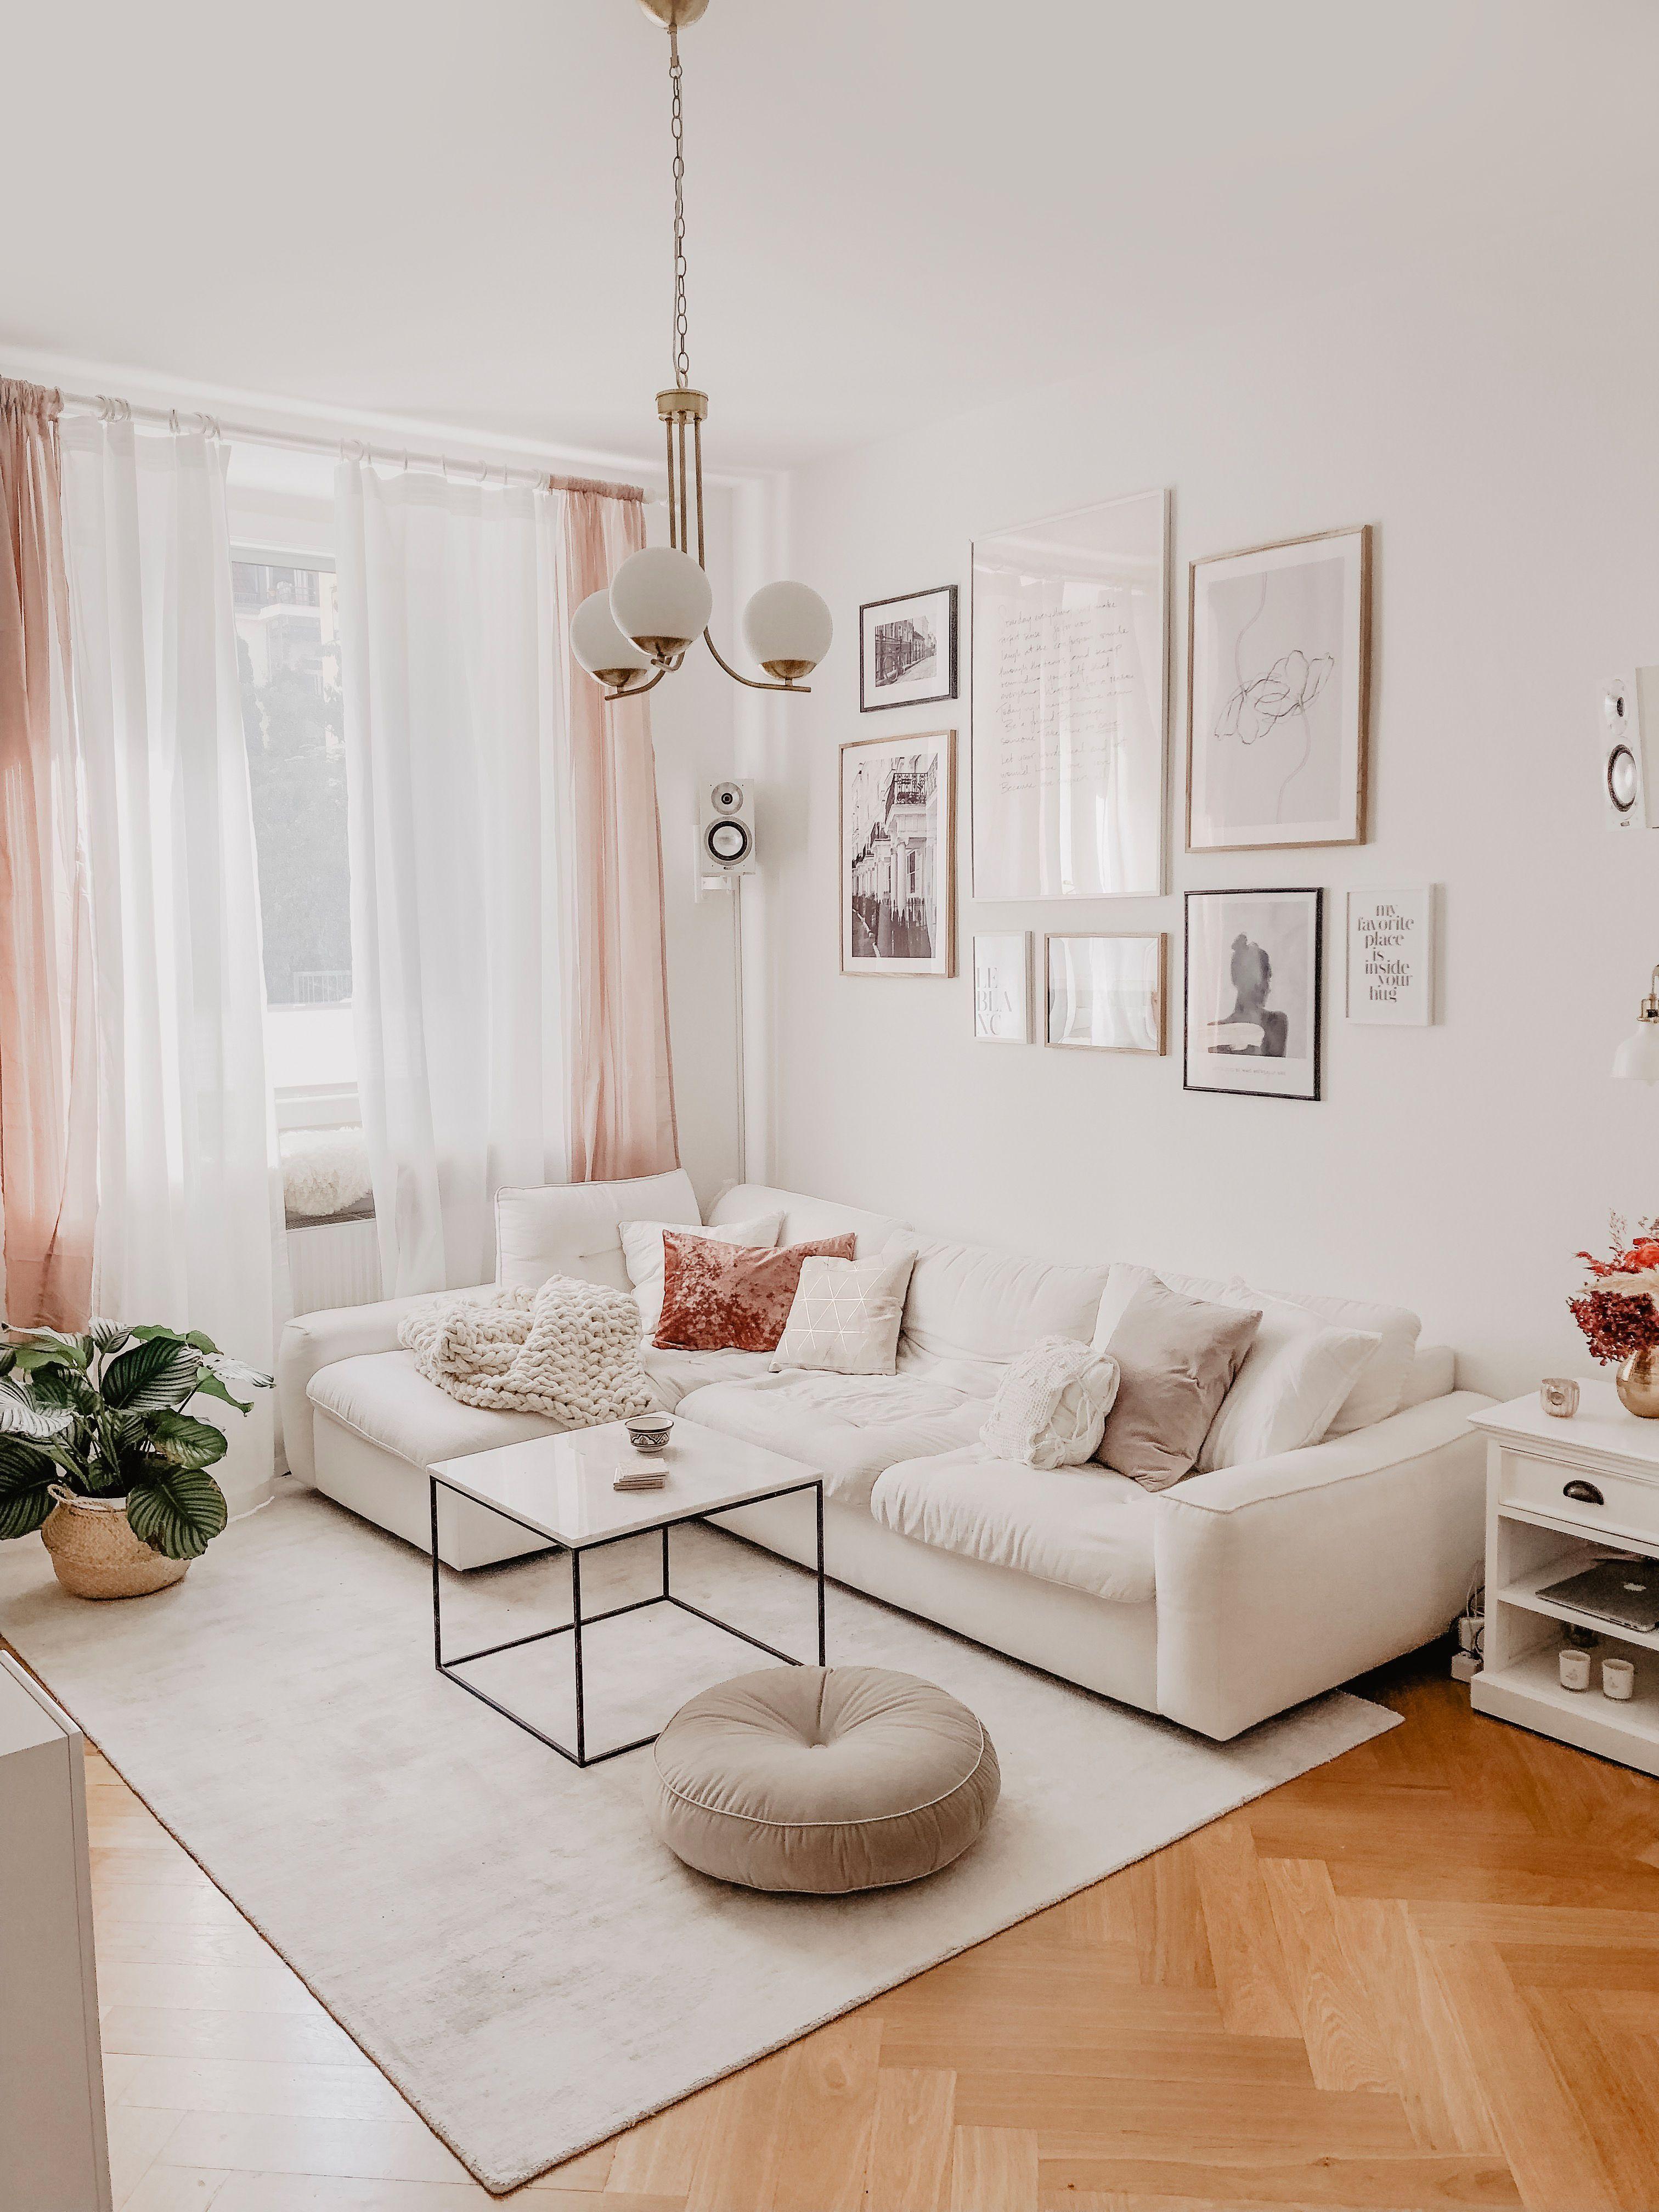 White Parisian Livingroom With Boho Elements And Red Decor In 2020 Parisian Living Room Living Room Scandinavian Living Room Decor Apartment